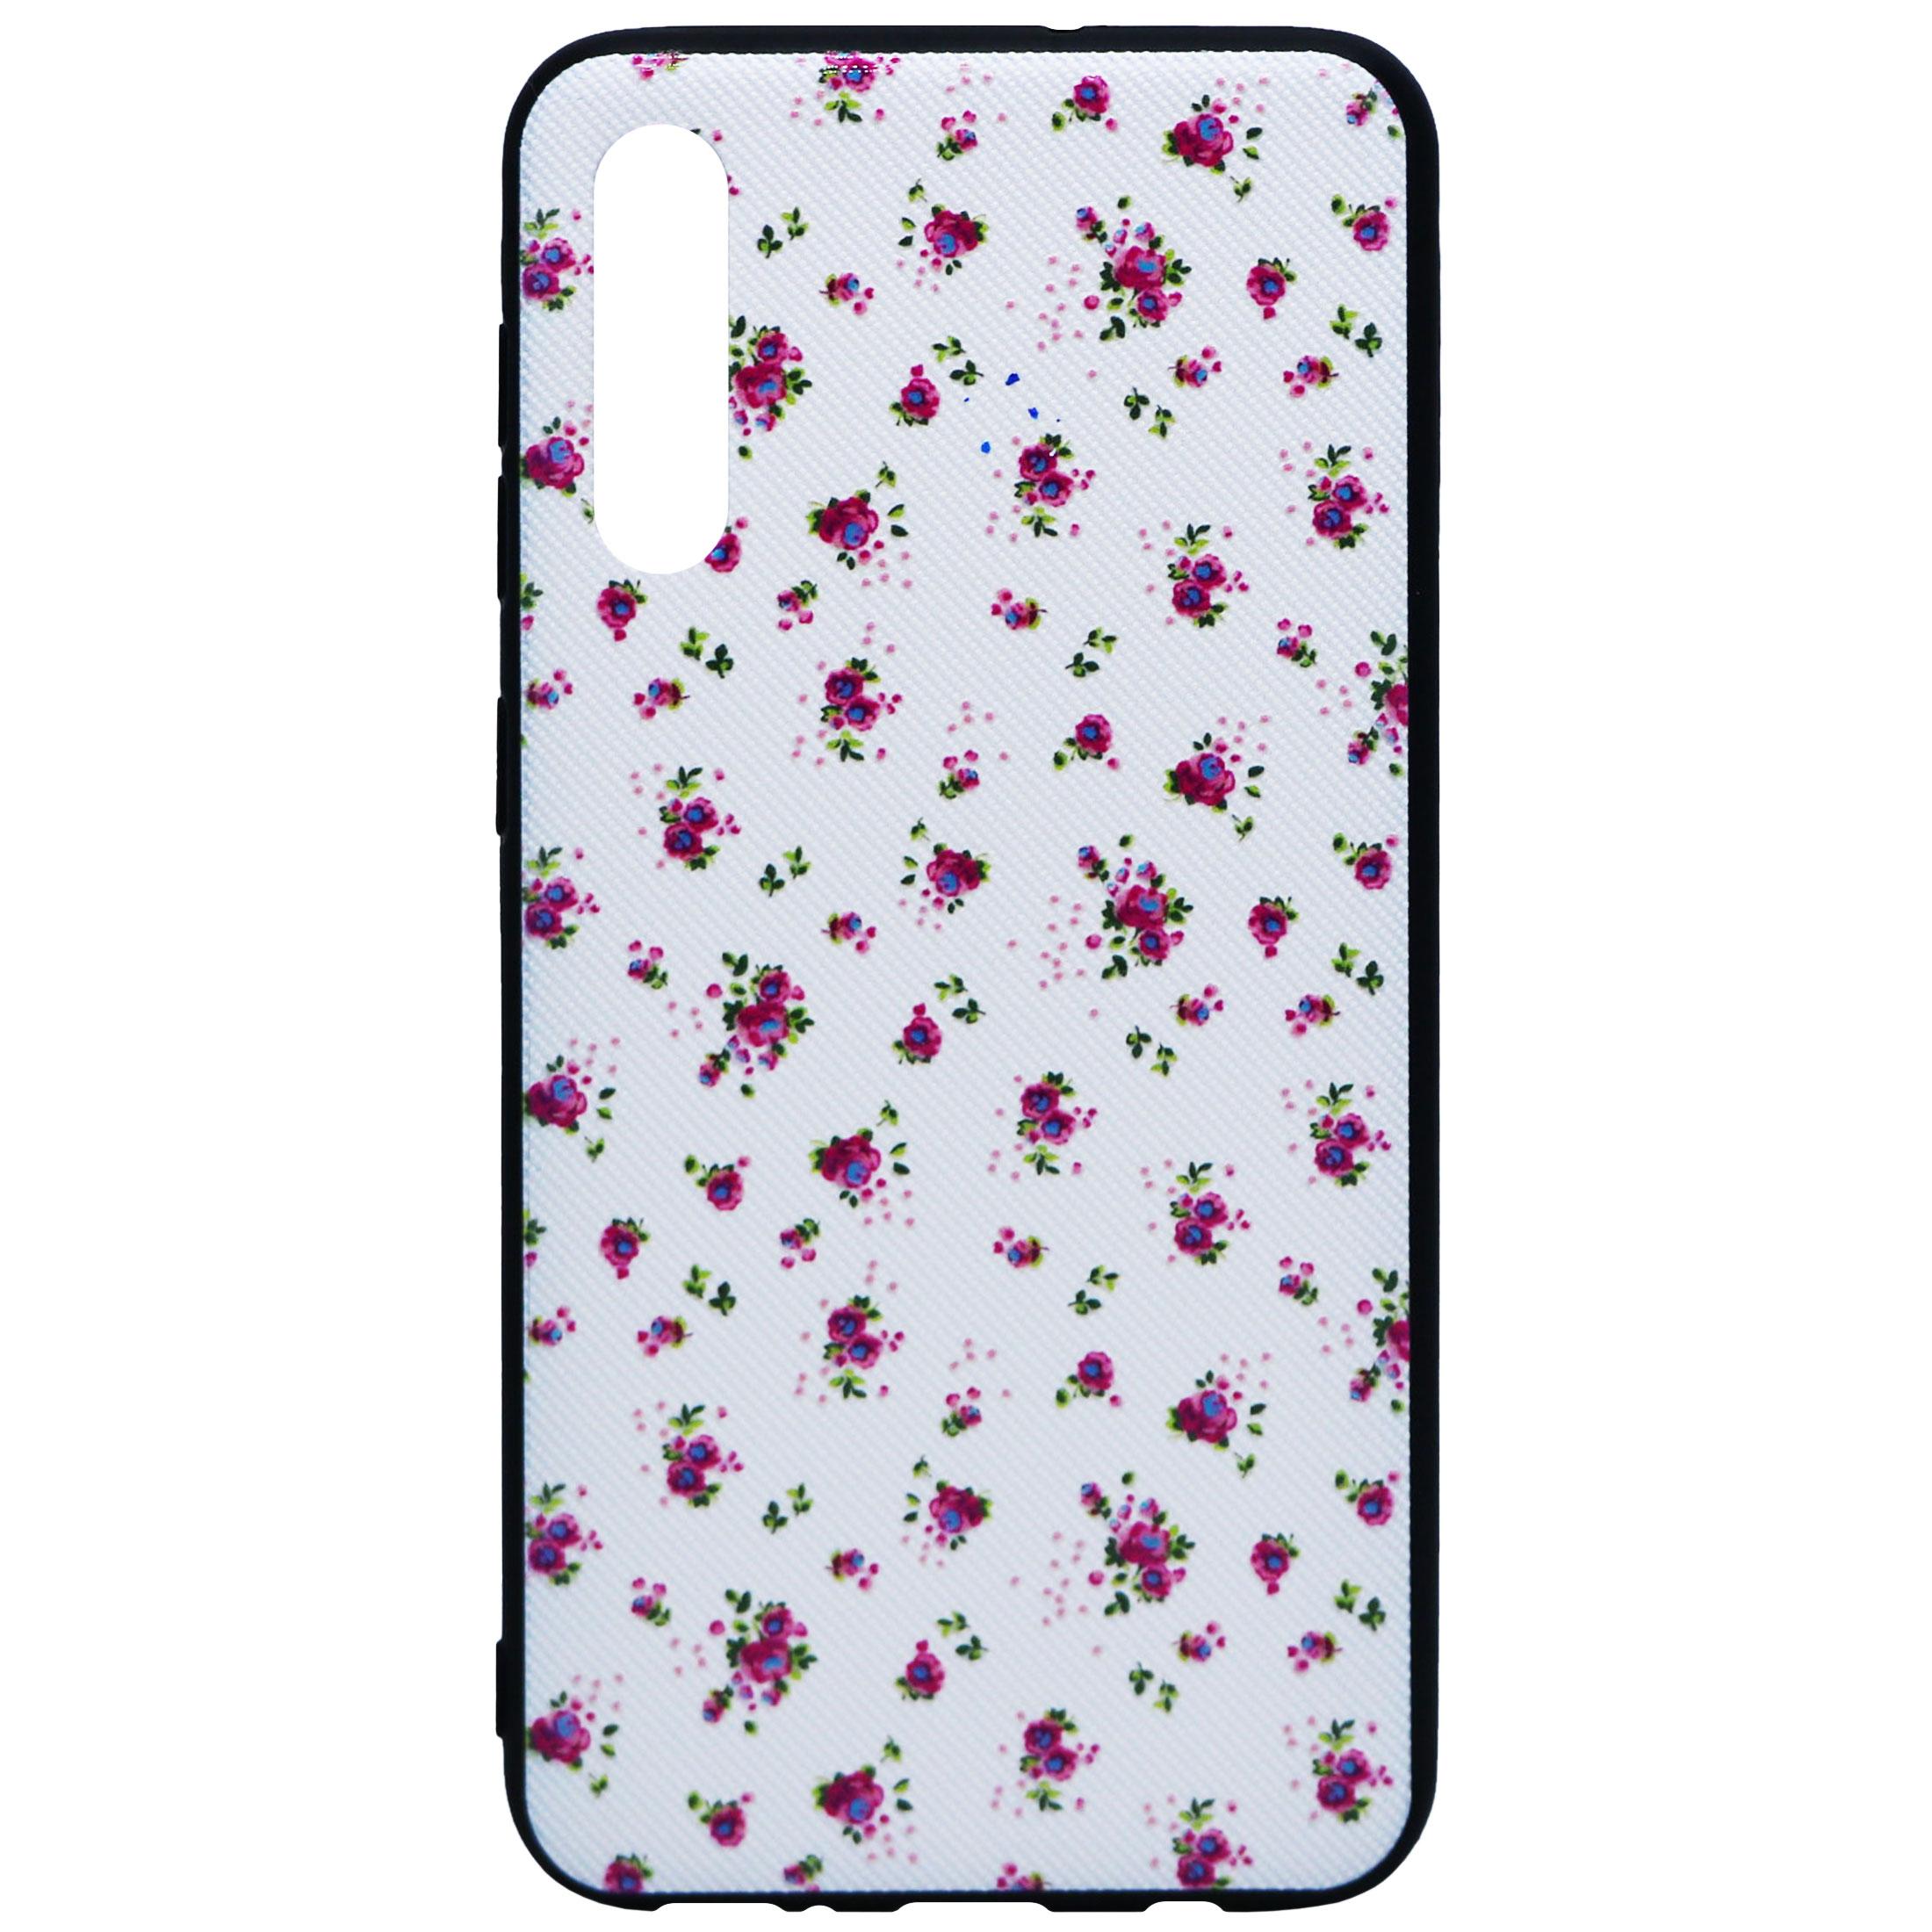 کاور طرح Pink Flowers مدل SS-01 مناسب برای گوشی موبایل سامسونگ Galaxy A50/A50s/A30s